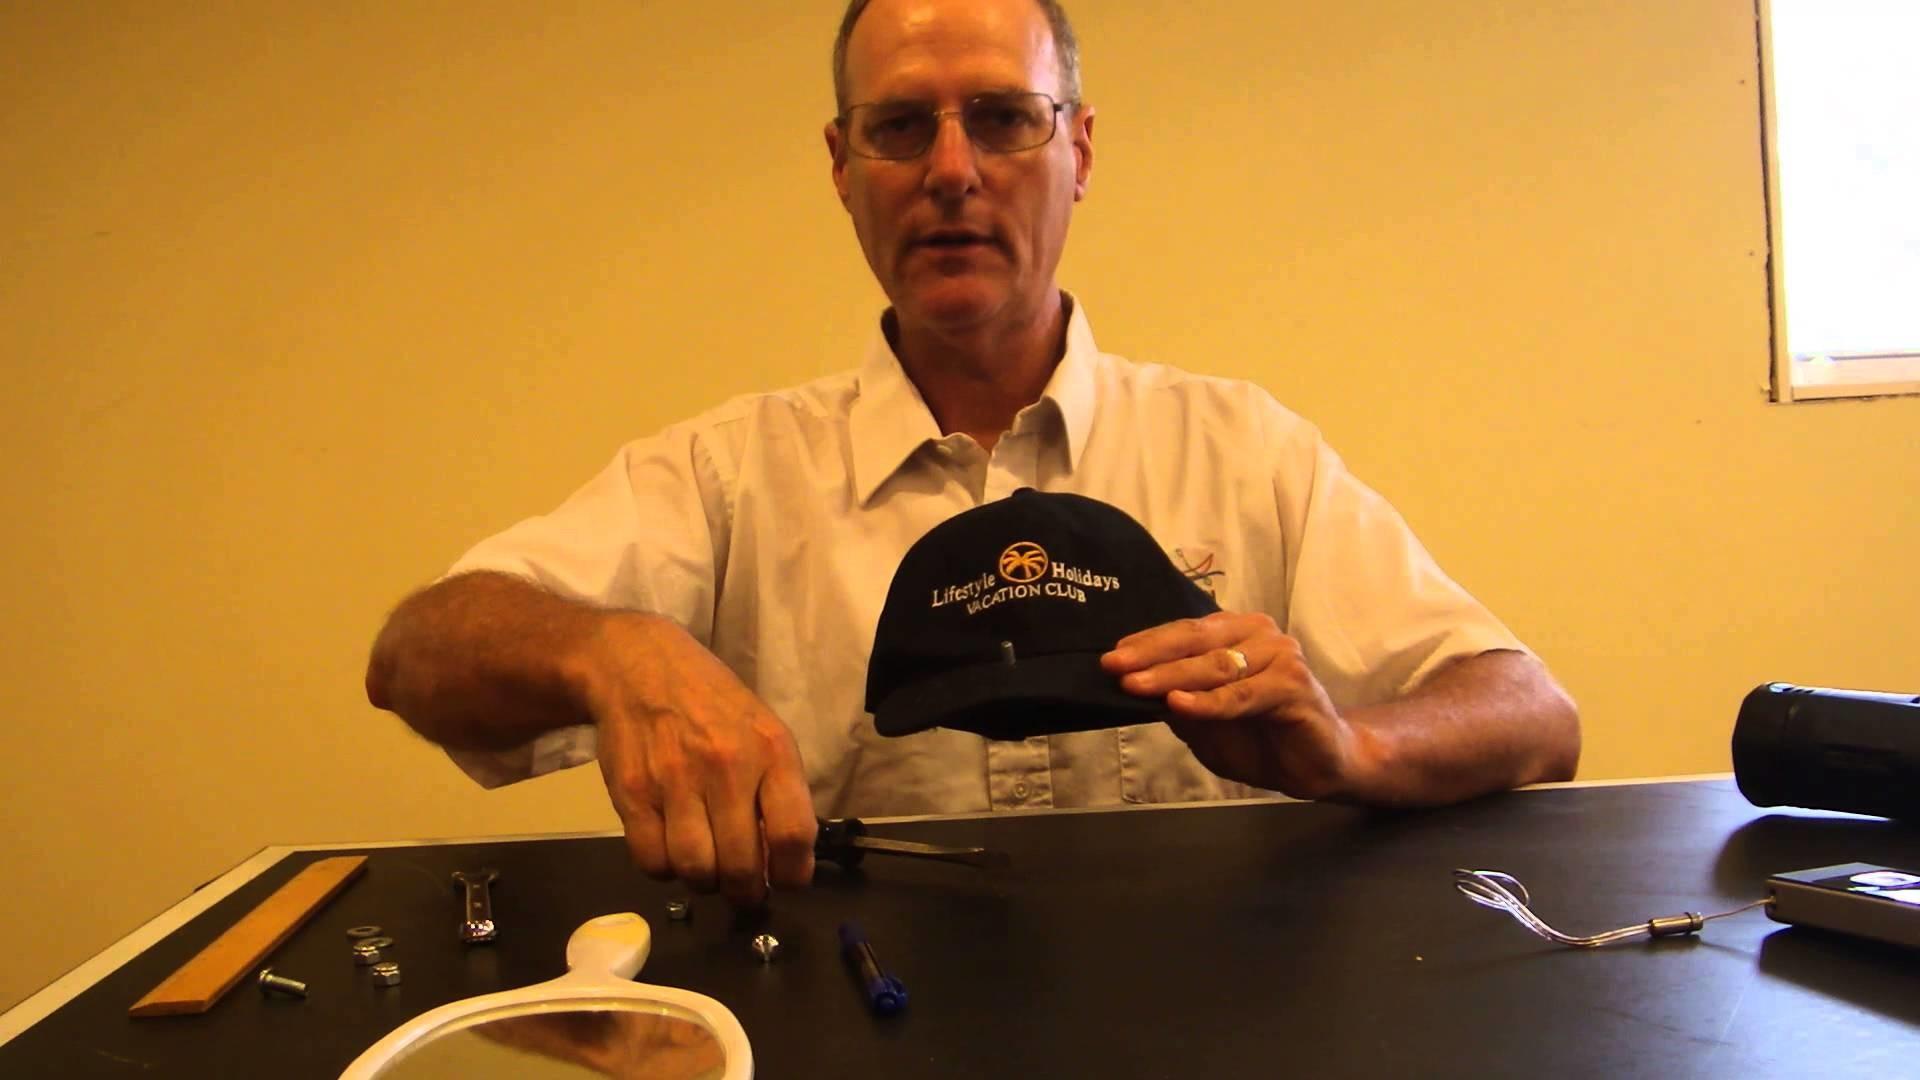 DIY hands free hat mount action video camera baseball cap